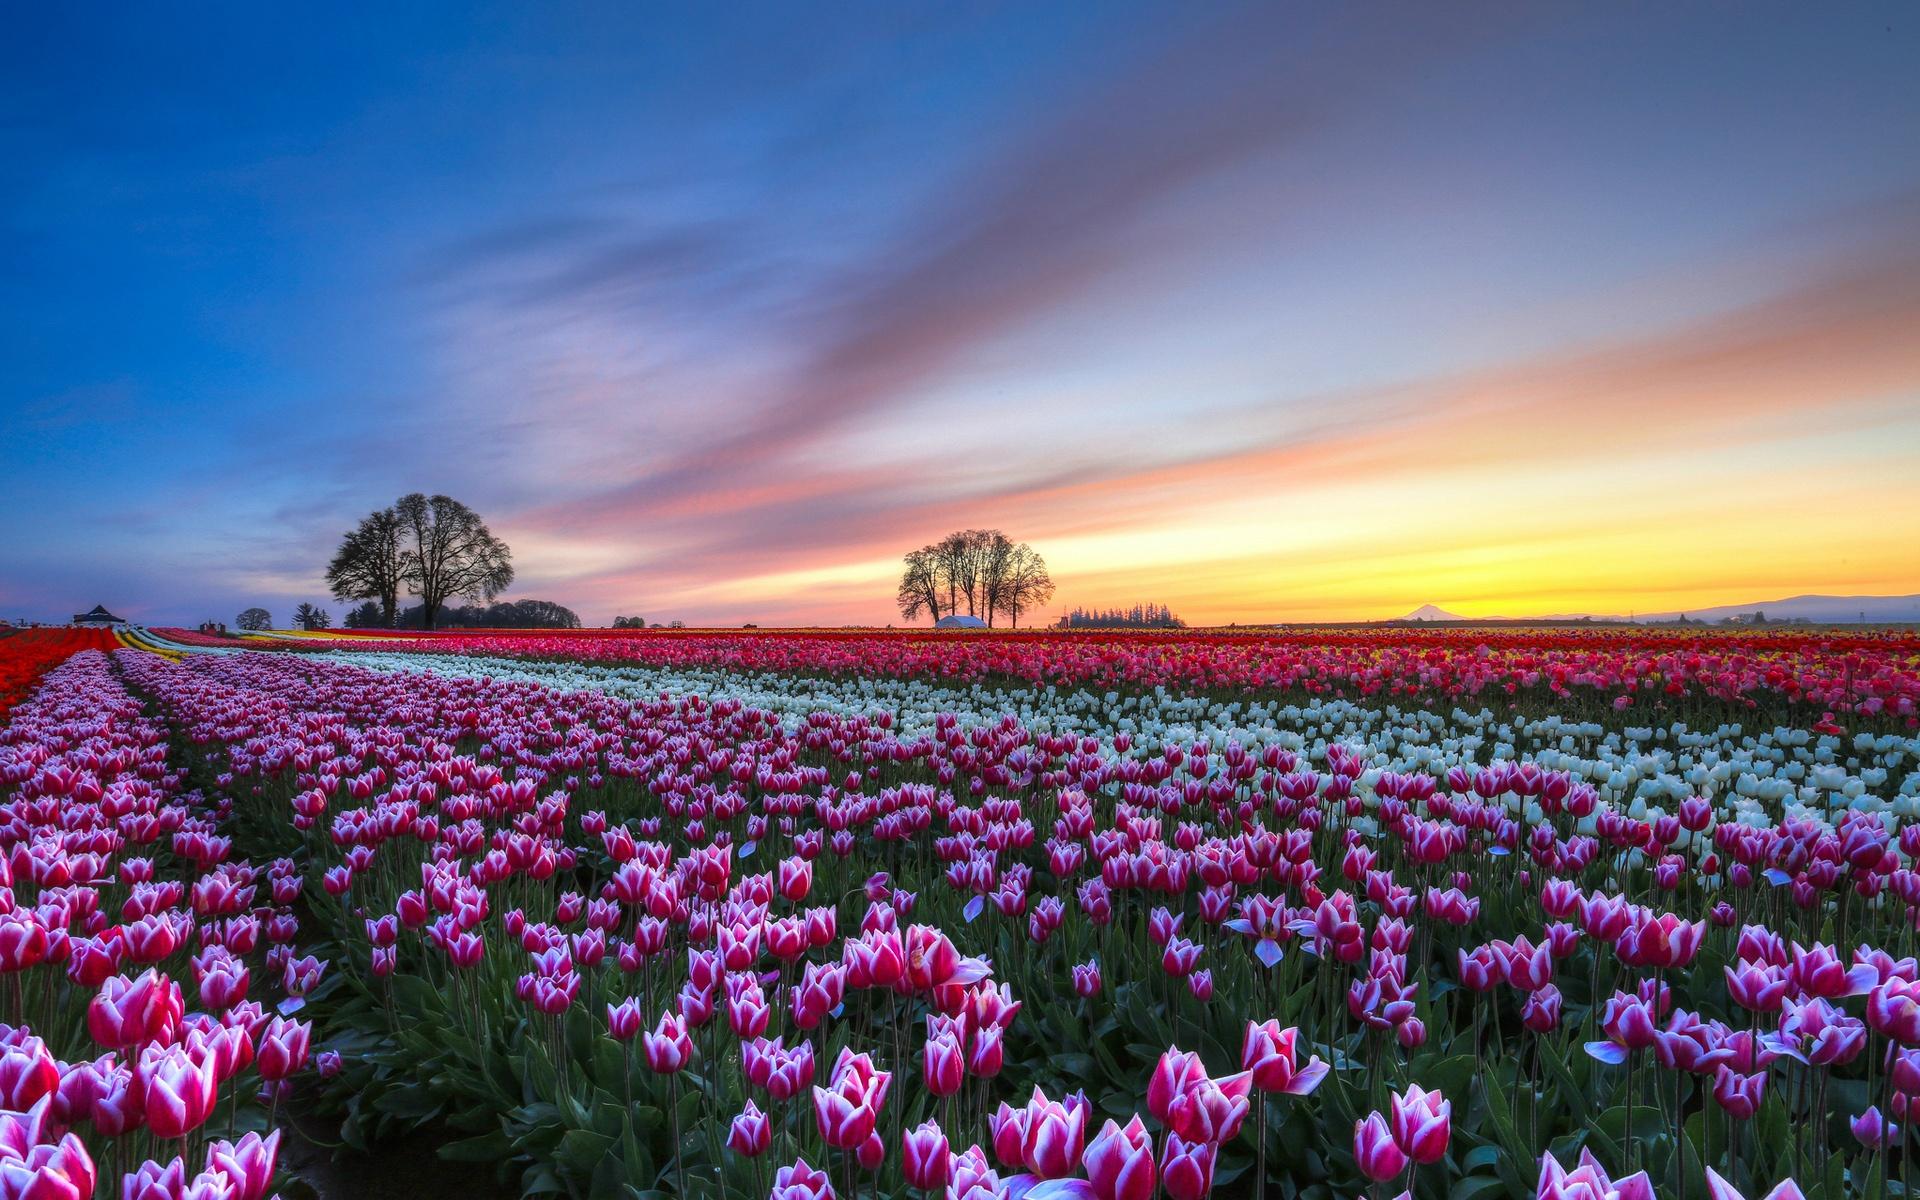 Flower Field Wallpaper - WallpaperSafari